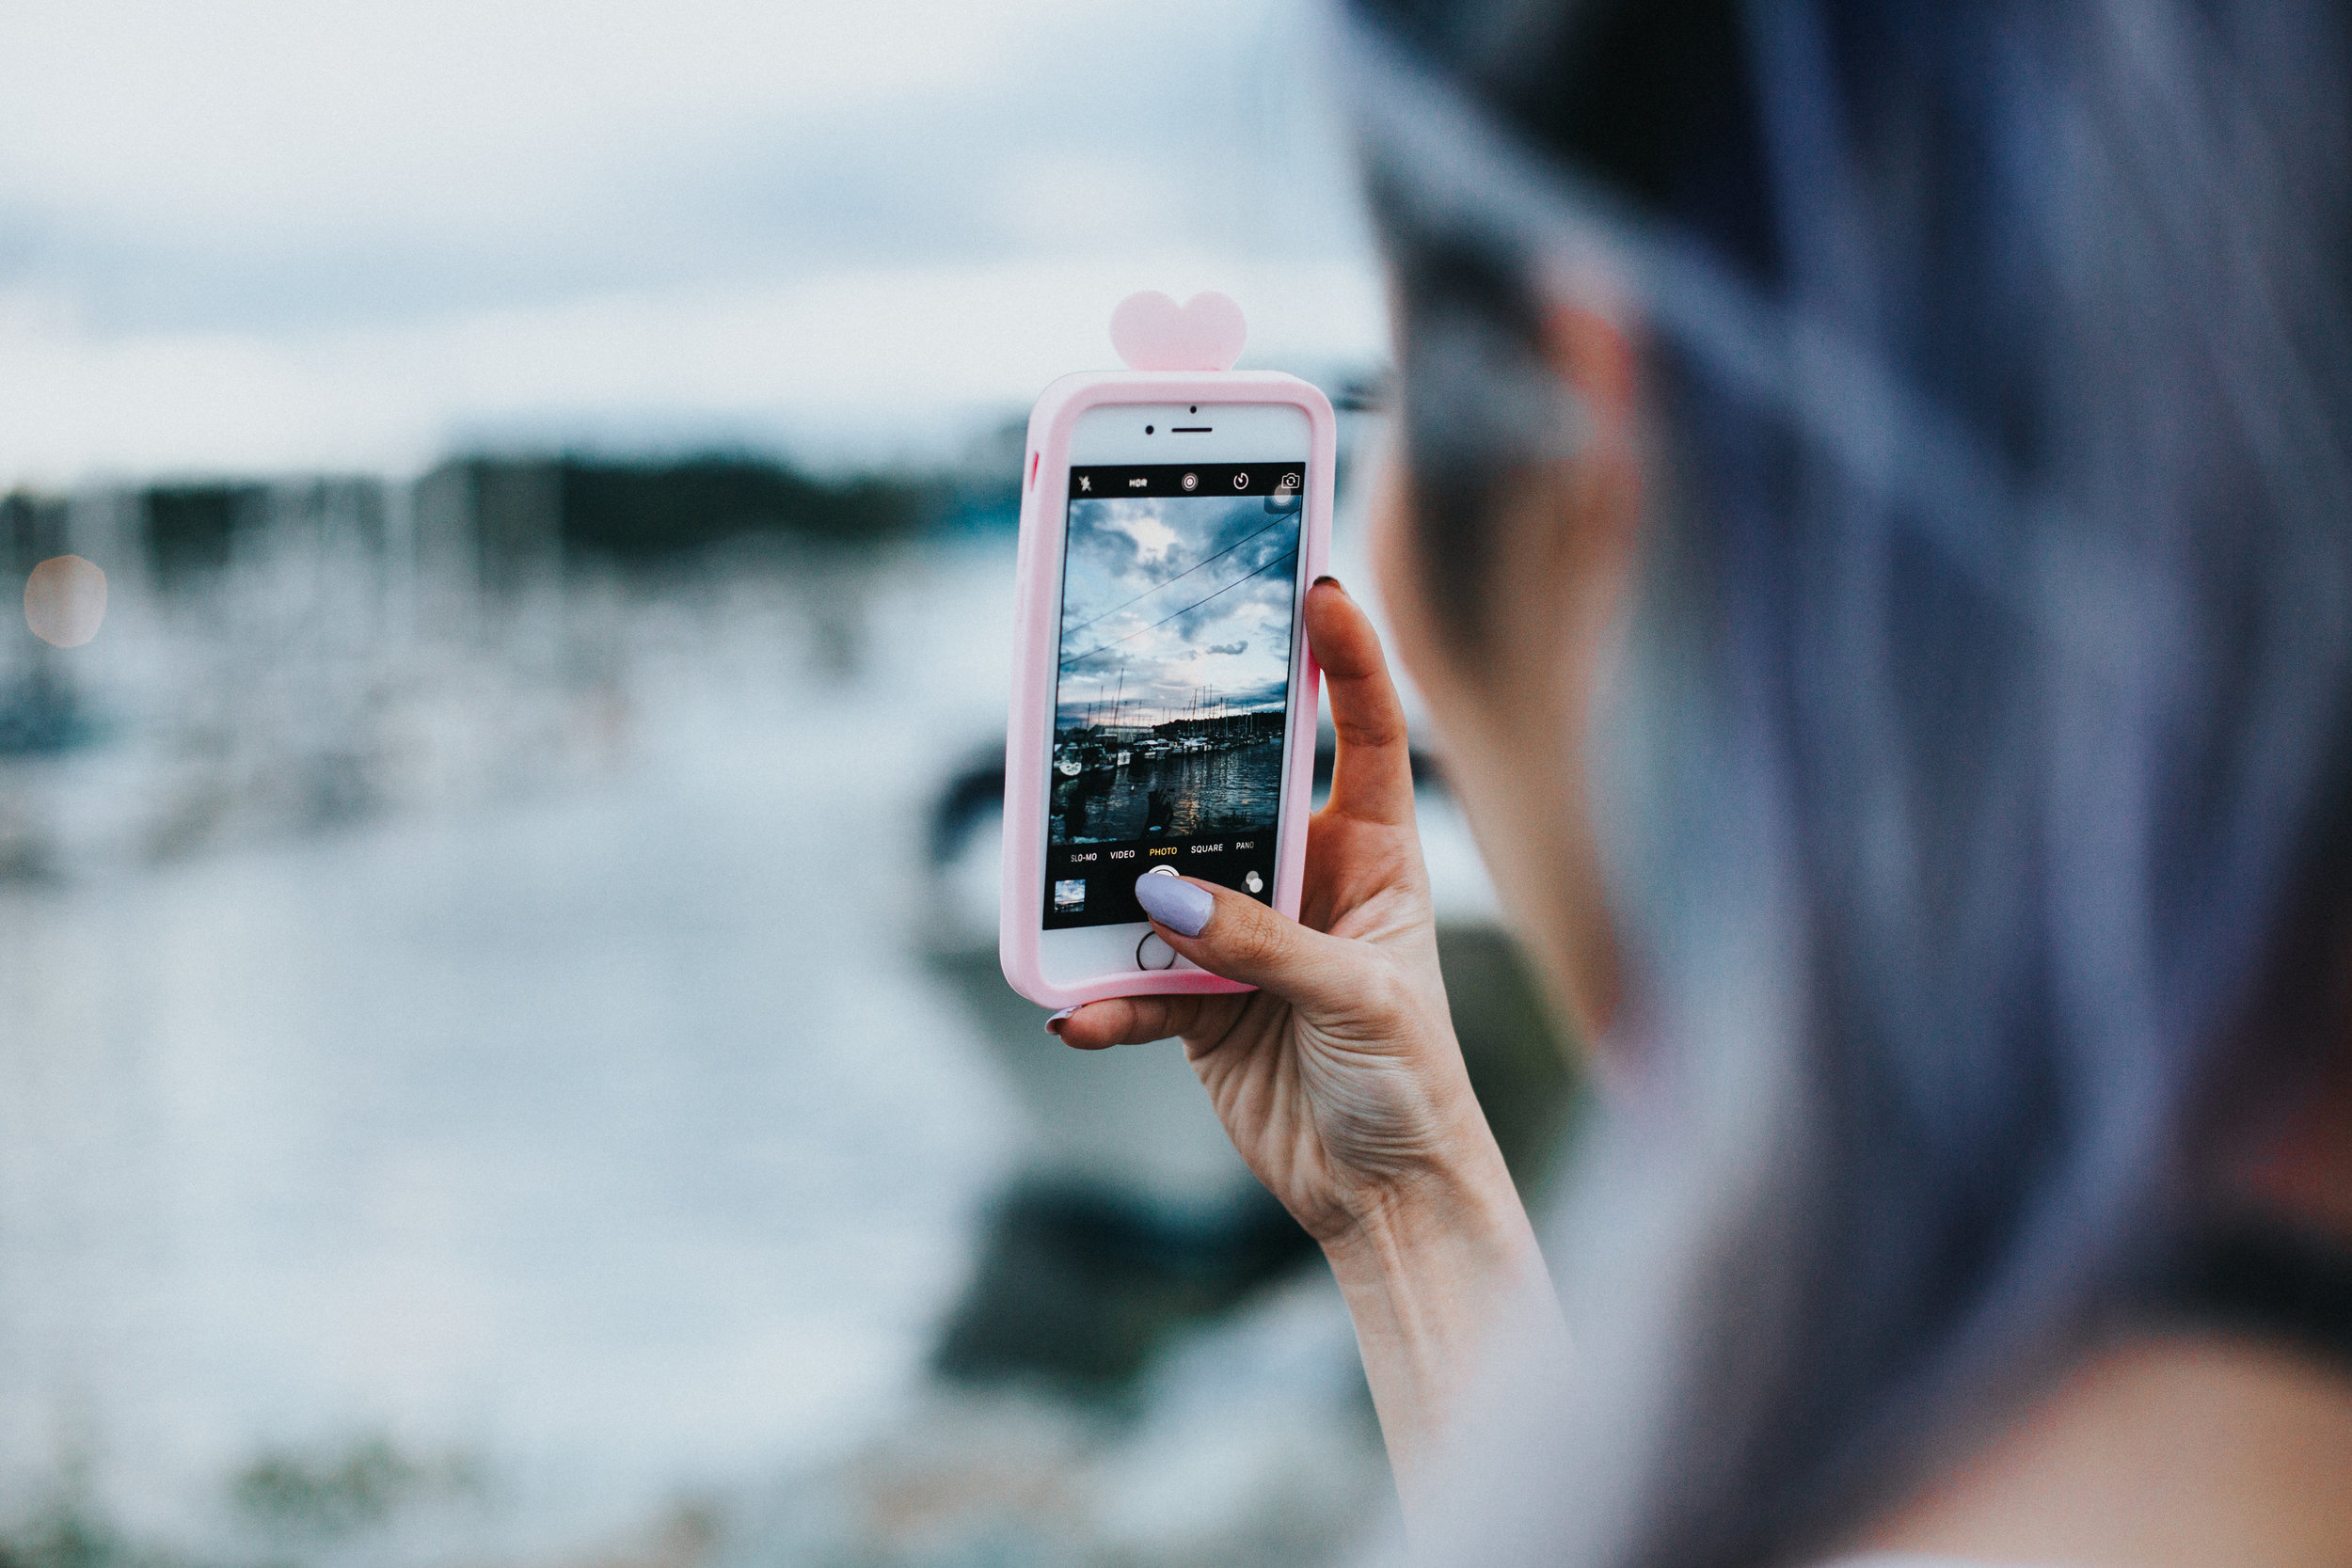 ZARA Silver Maxi Slip Dress_Missguided Black Choker_Revolve White Tee_JustFab Red Mini Bag_Topknot Hair_Mermaid Hair_Lavender Hair_Aikas Love Closet_Seattle Fashion Style Blogger from Japan_No Weekends Pink Mirrored Sunnies_Zara Pink Bomber Jacket